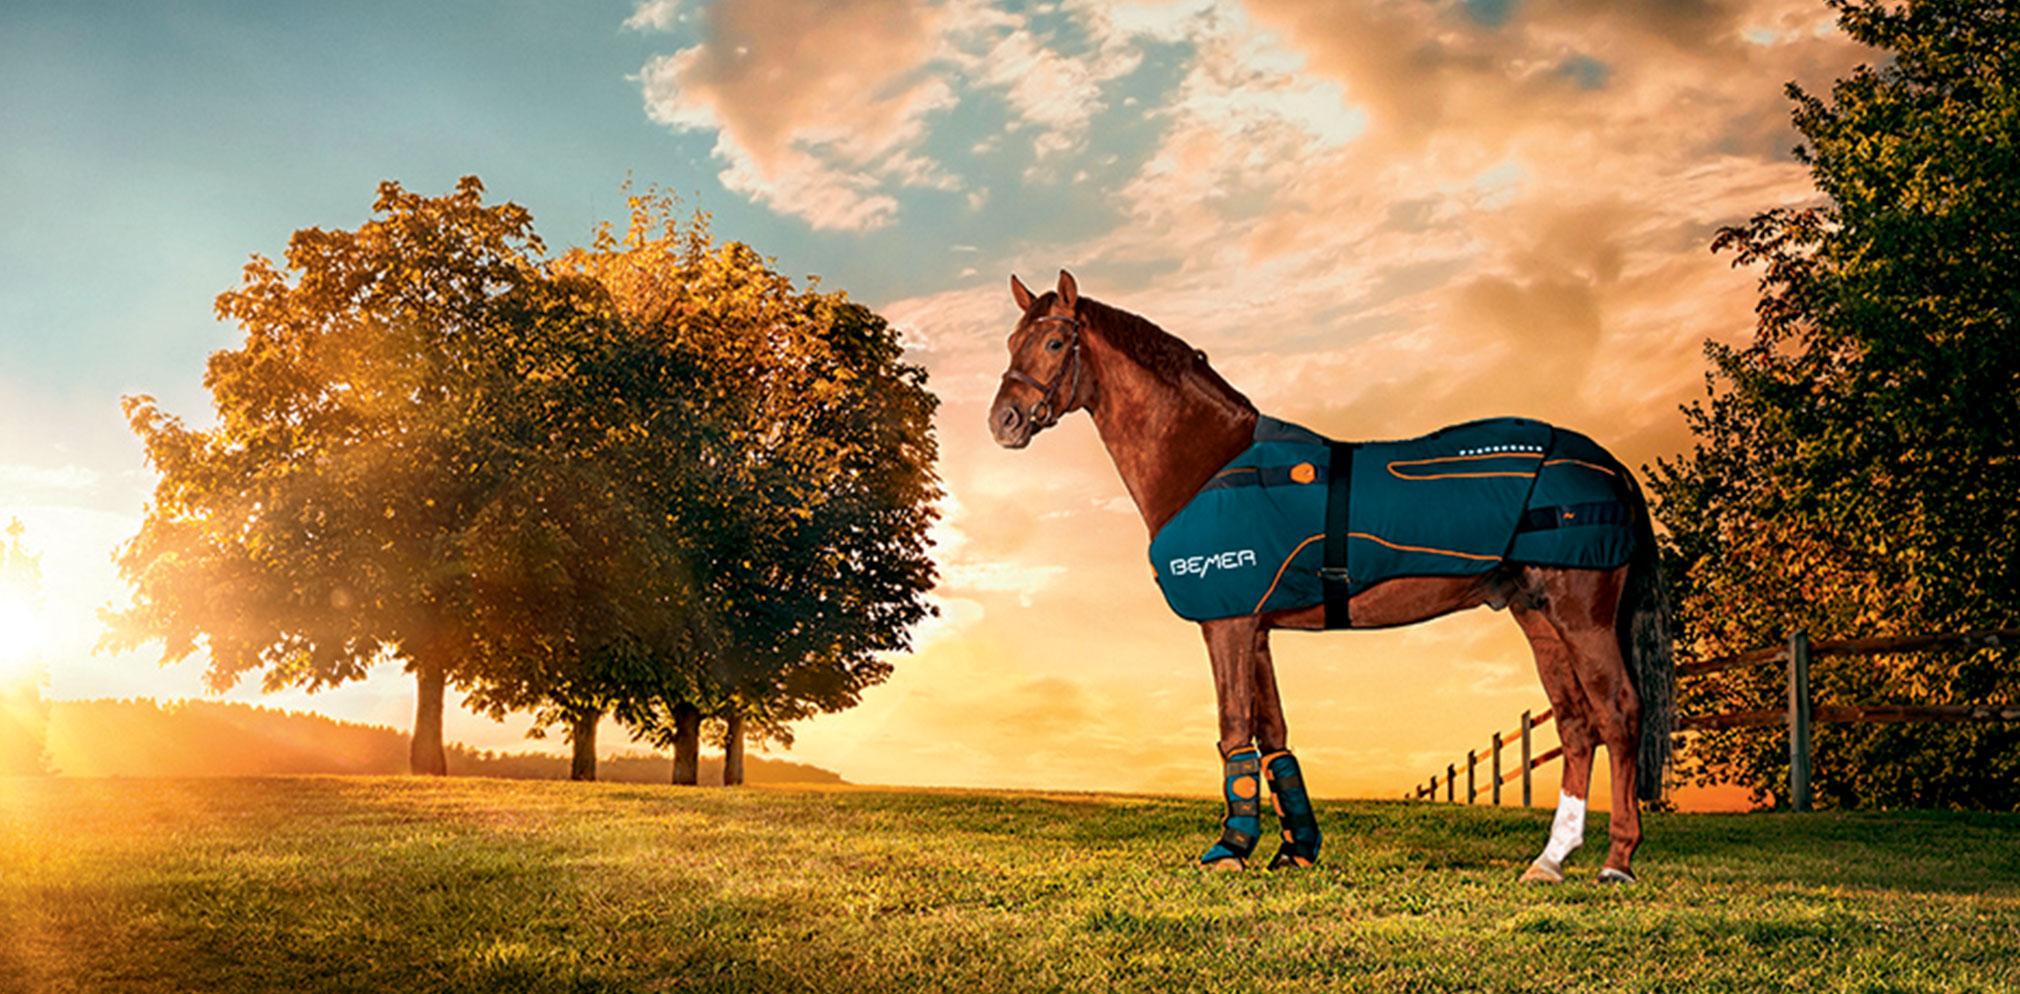 Horse Set BEMER